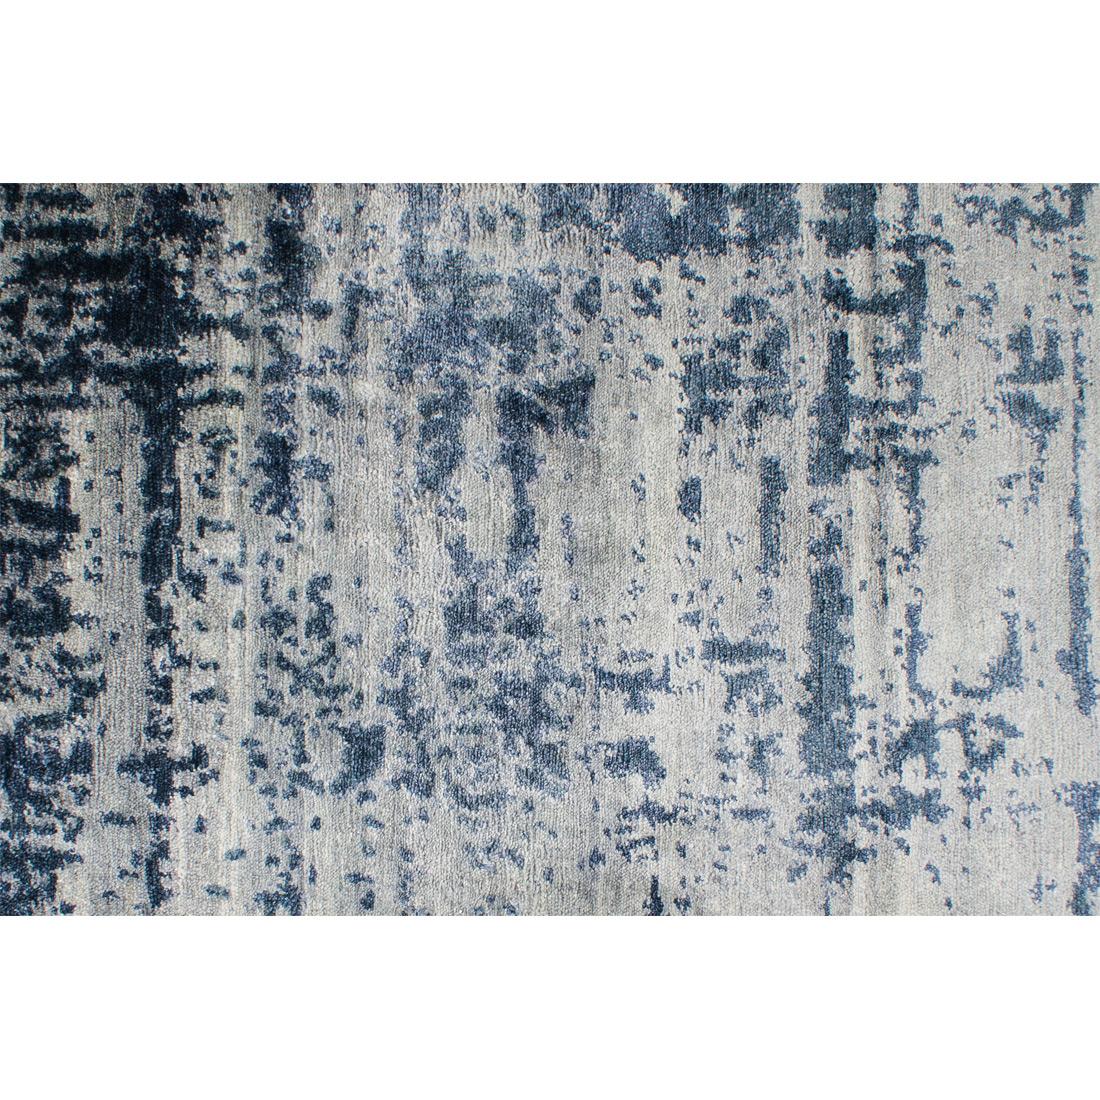 Vloerkleed Xilento Bamboo Grey Blue | 200 x 300 cm